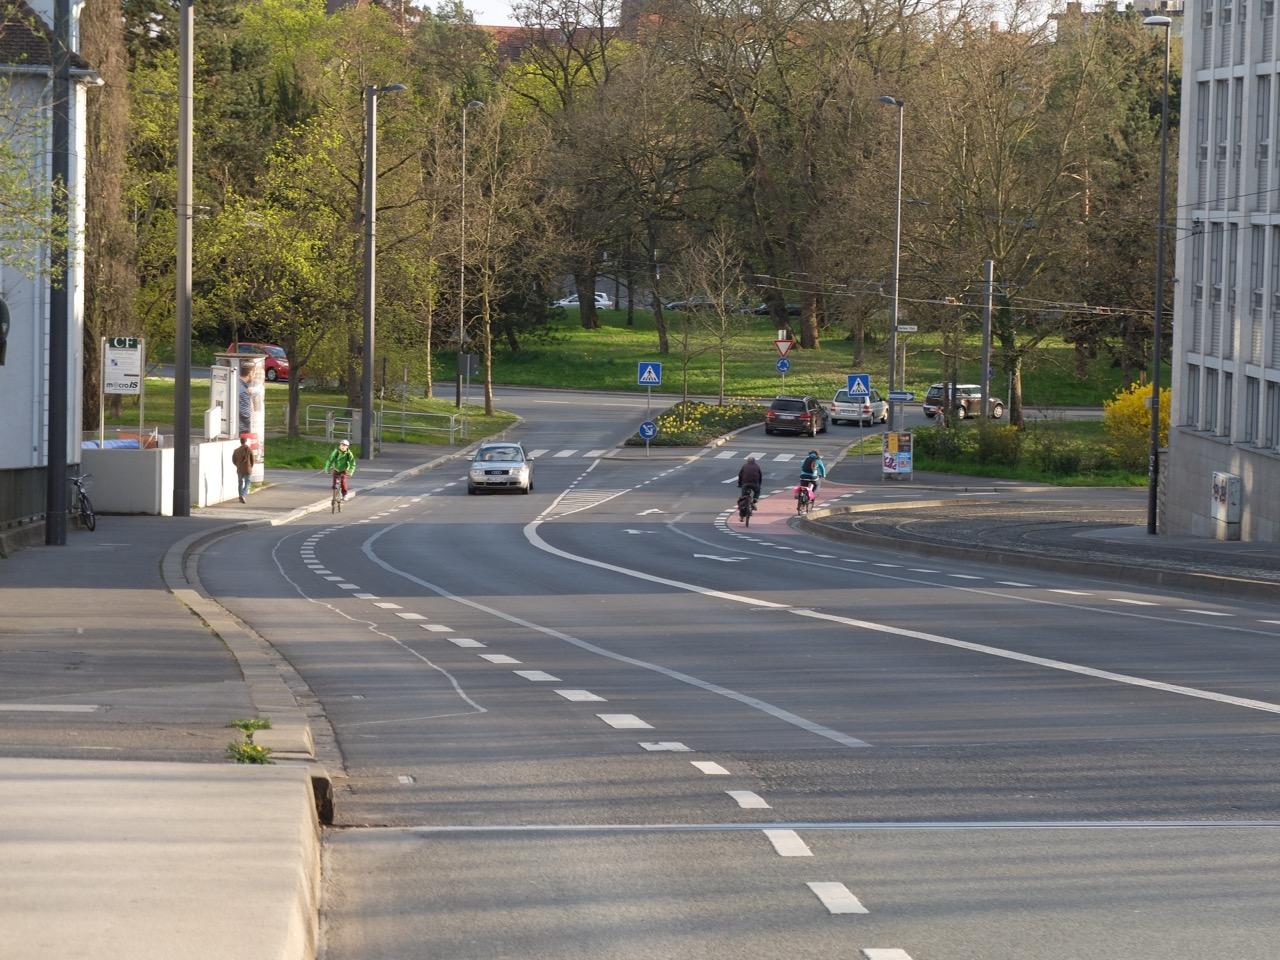 Grombühlbrücke richtung Berliner Ring | Radfahrerzone.de